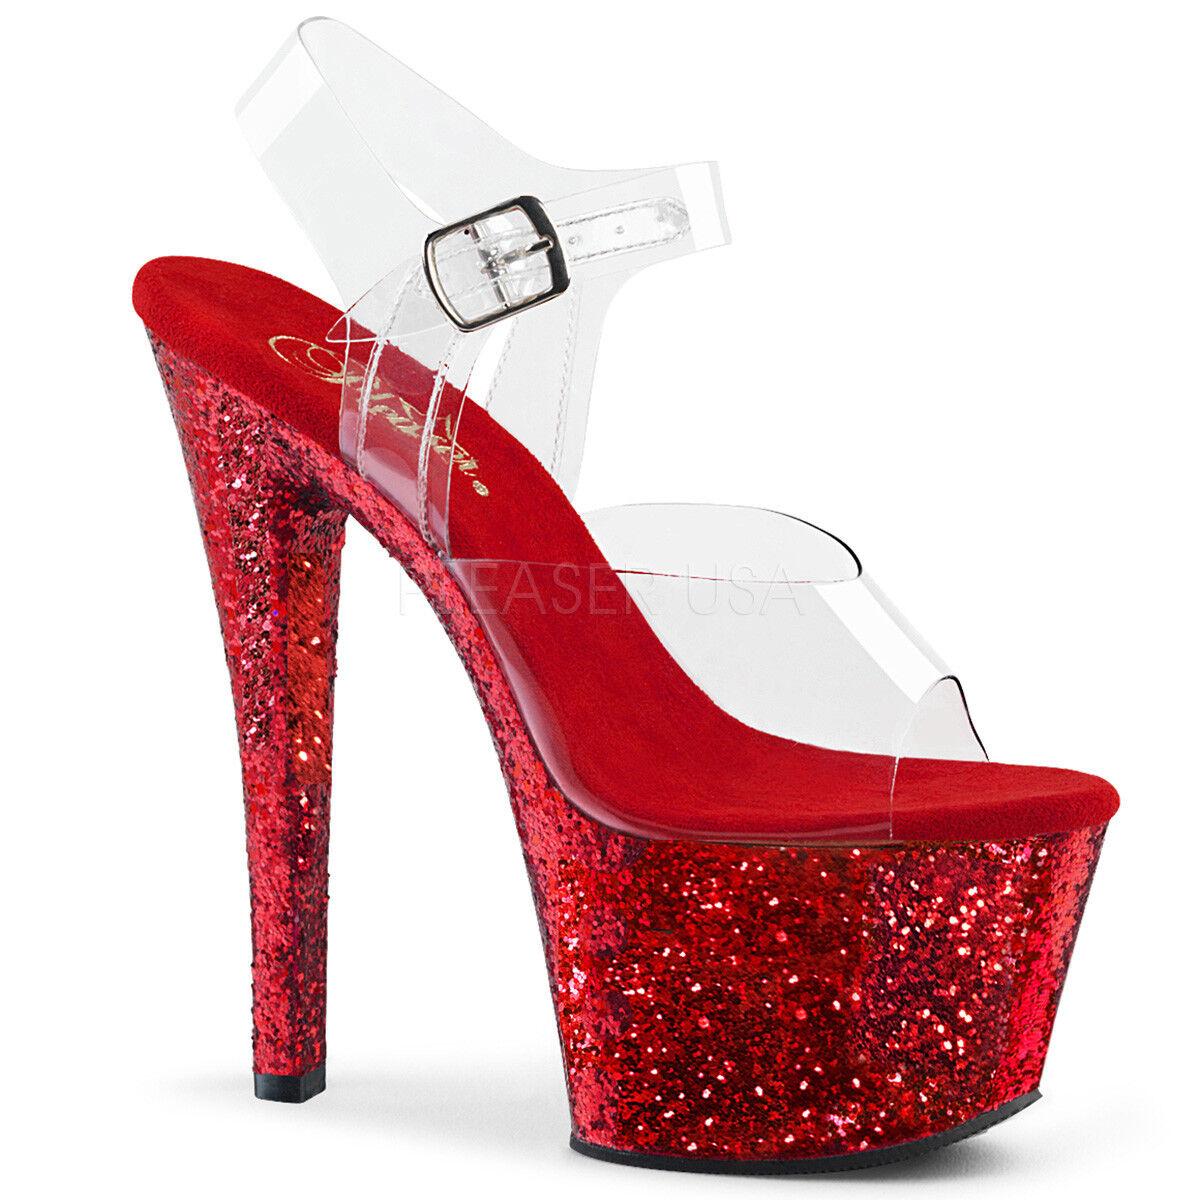 Pleaser SKY-308LG damen Clear rot Glitter High Heel Platform Ankle Ankle Ankle Strap Sandal b9d042